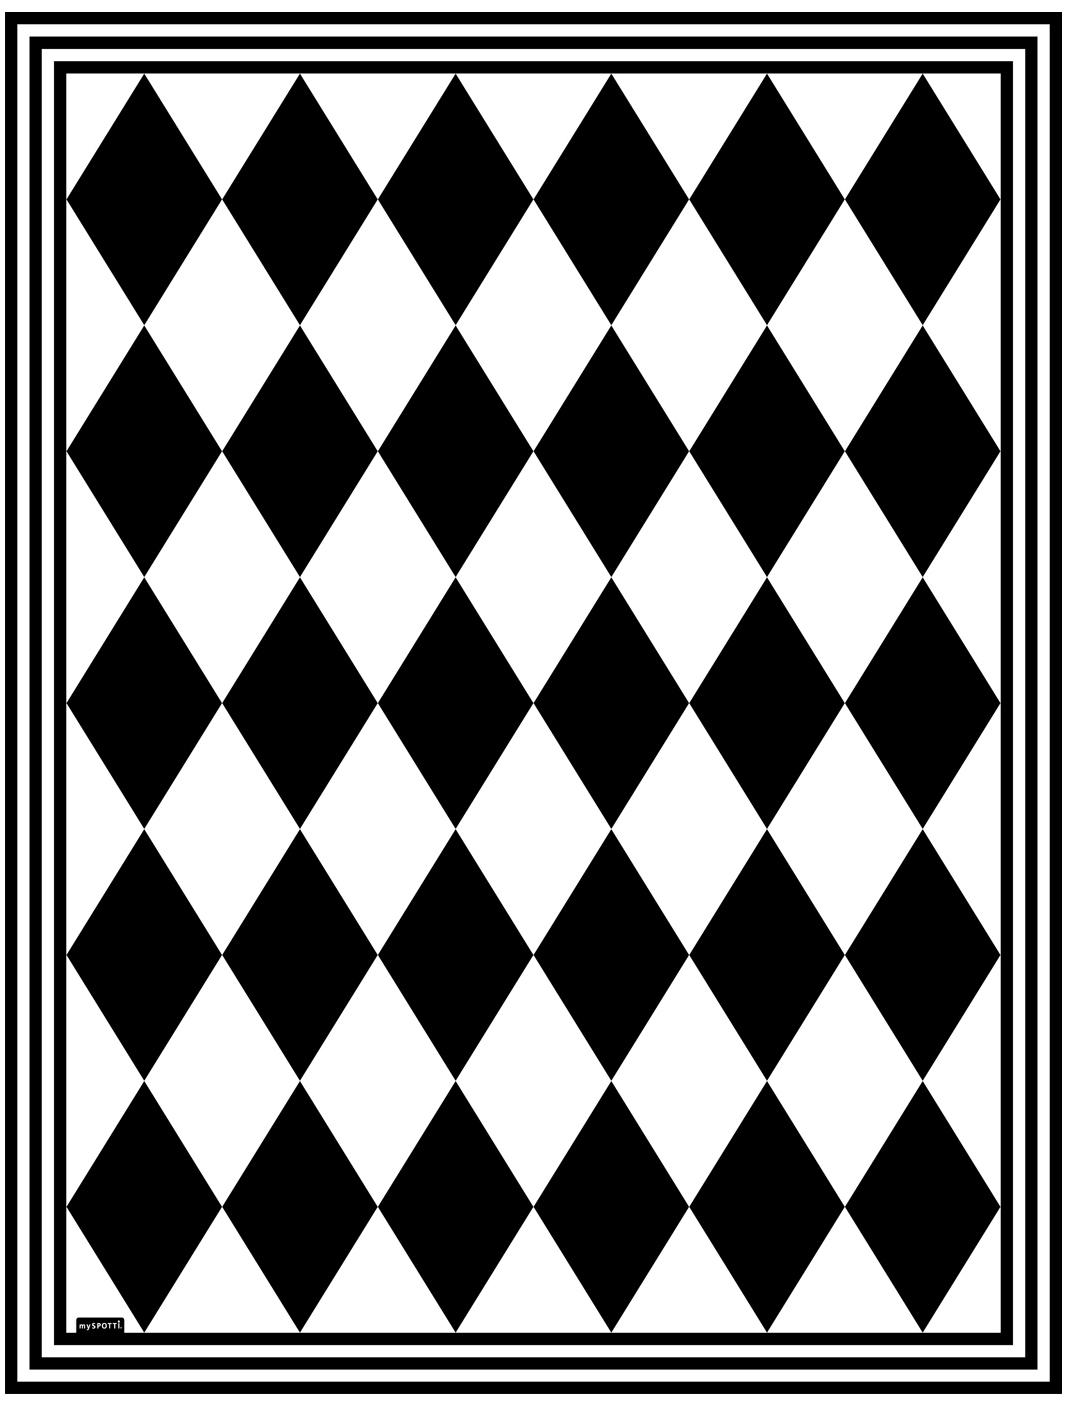 Alfombra vinílica Bobby II, Vinilo, reciclable, Negro, blanco, An 65 x L 85 cm